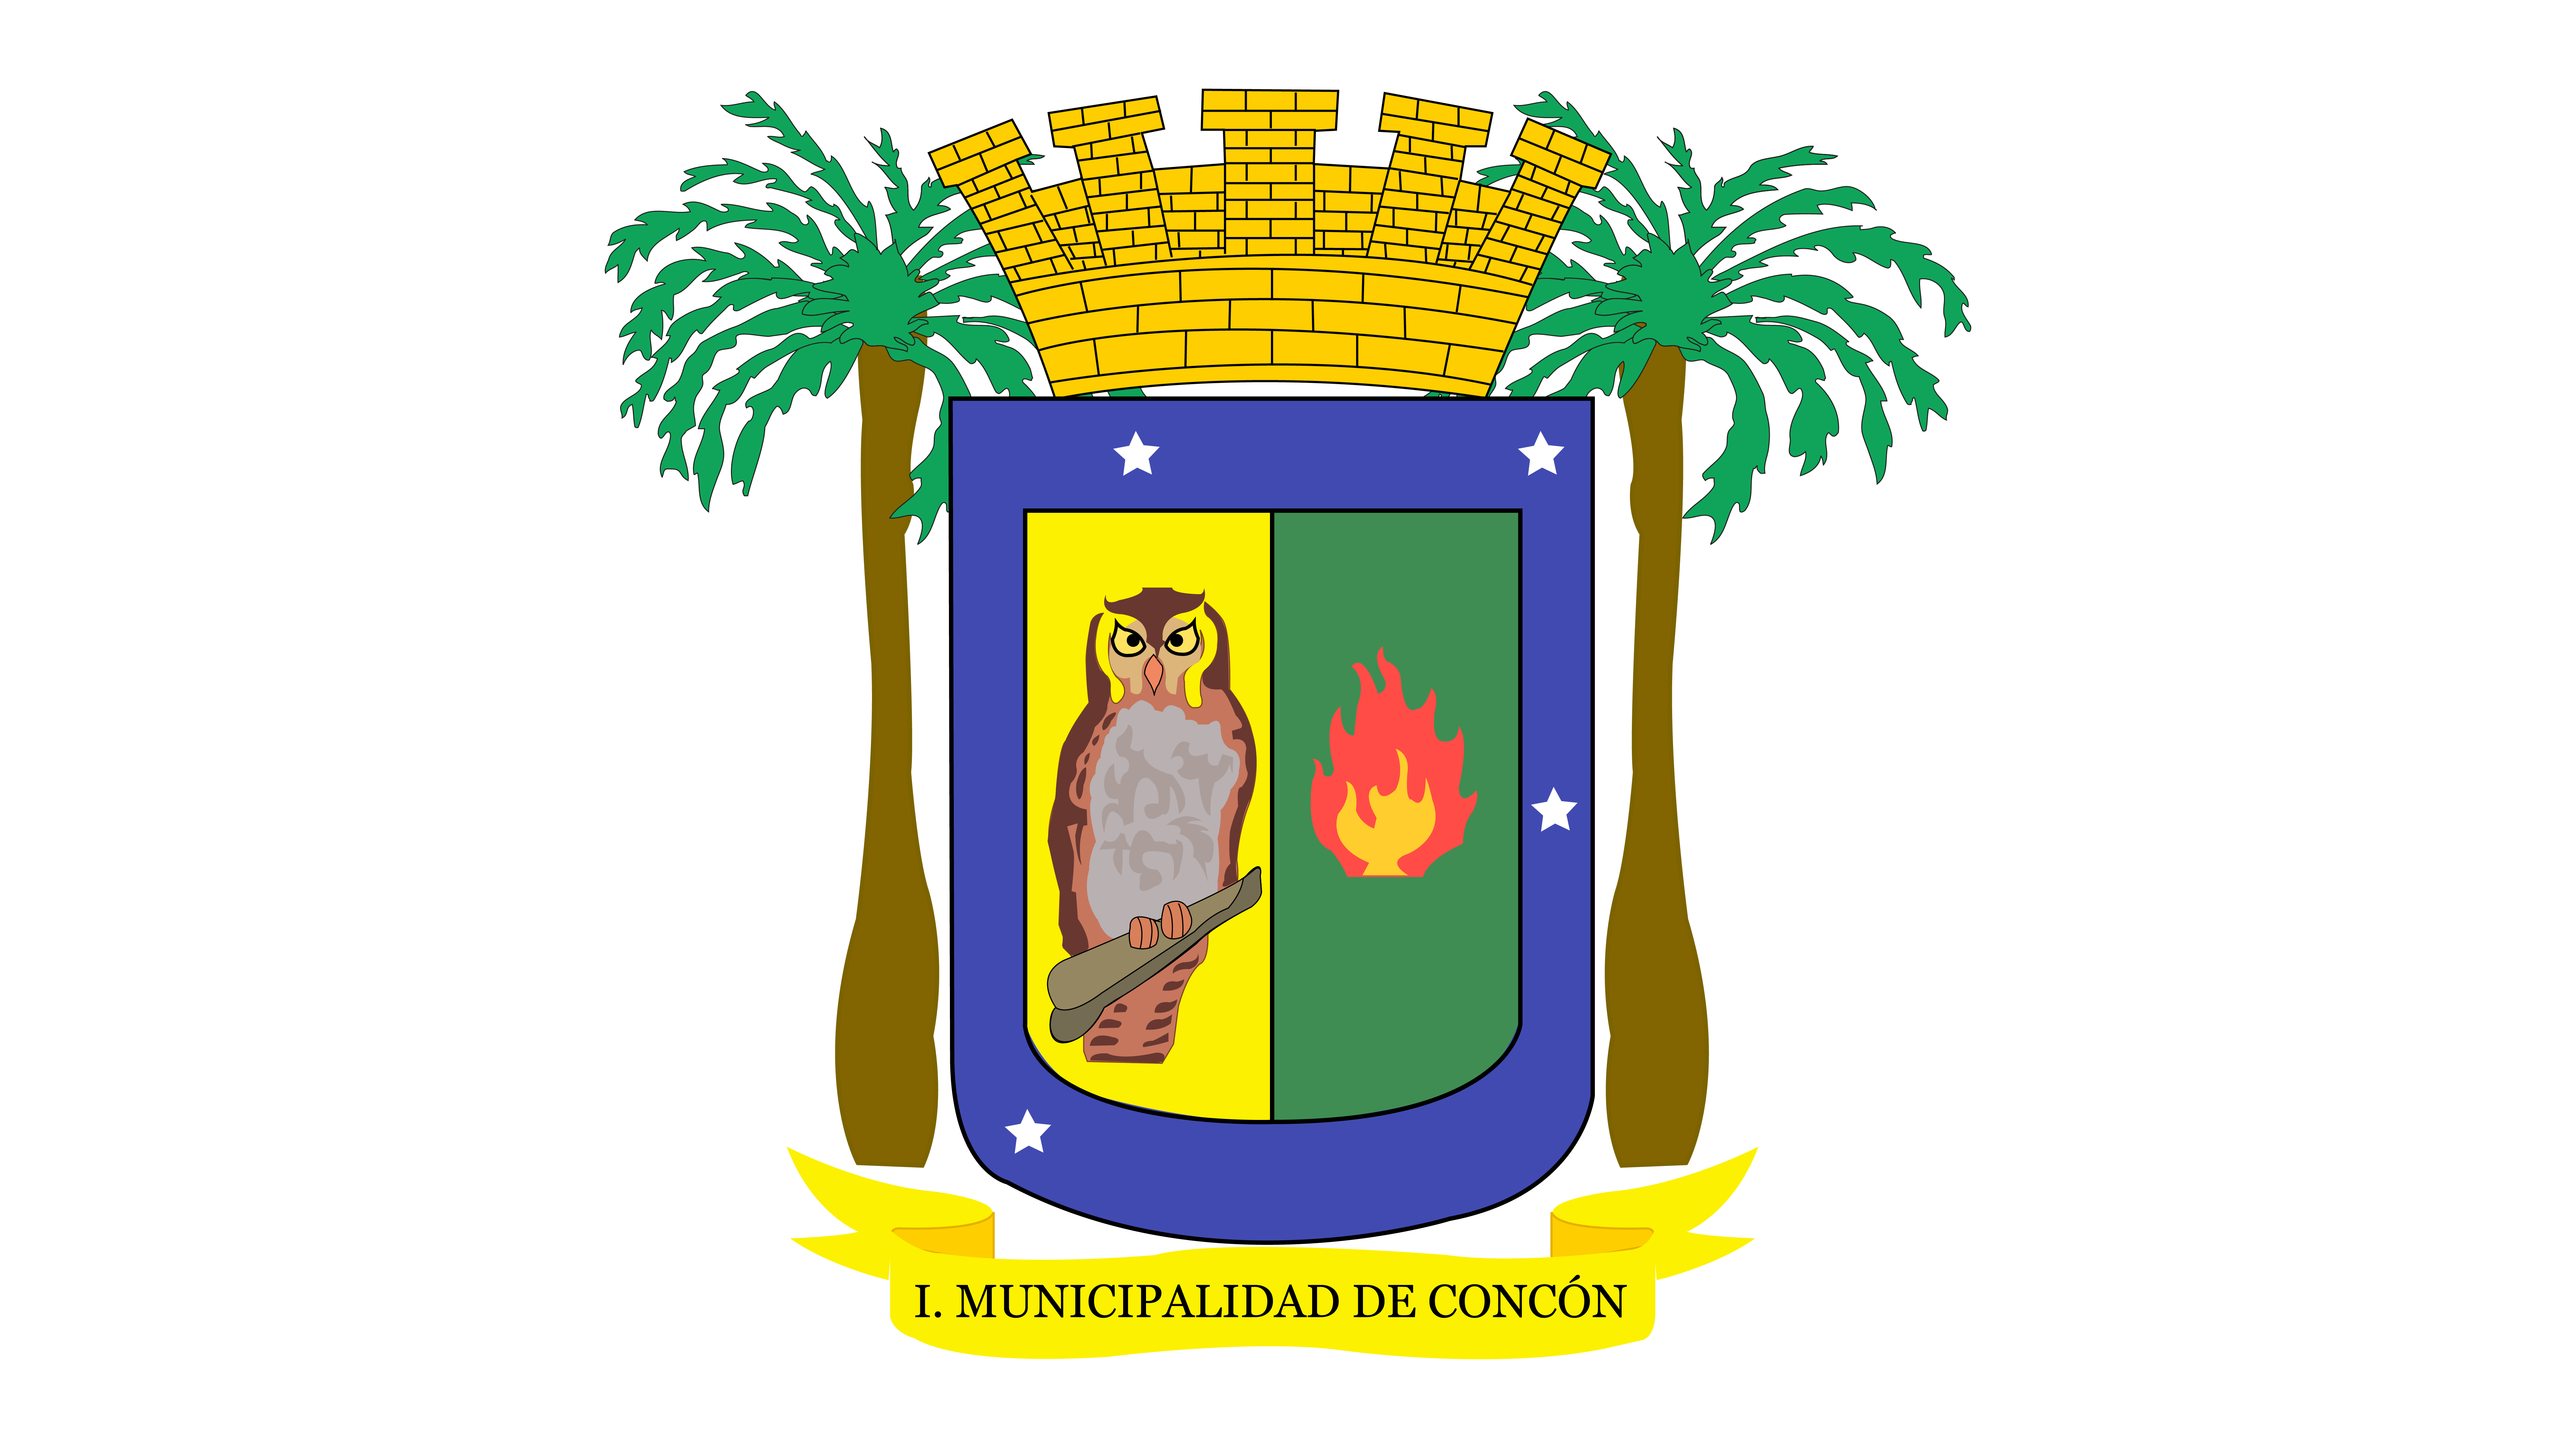 I. Municipalidad de Concón